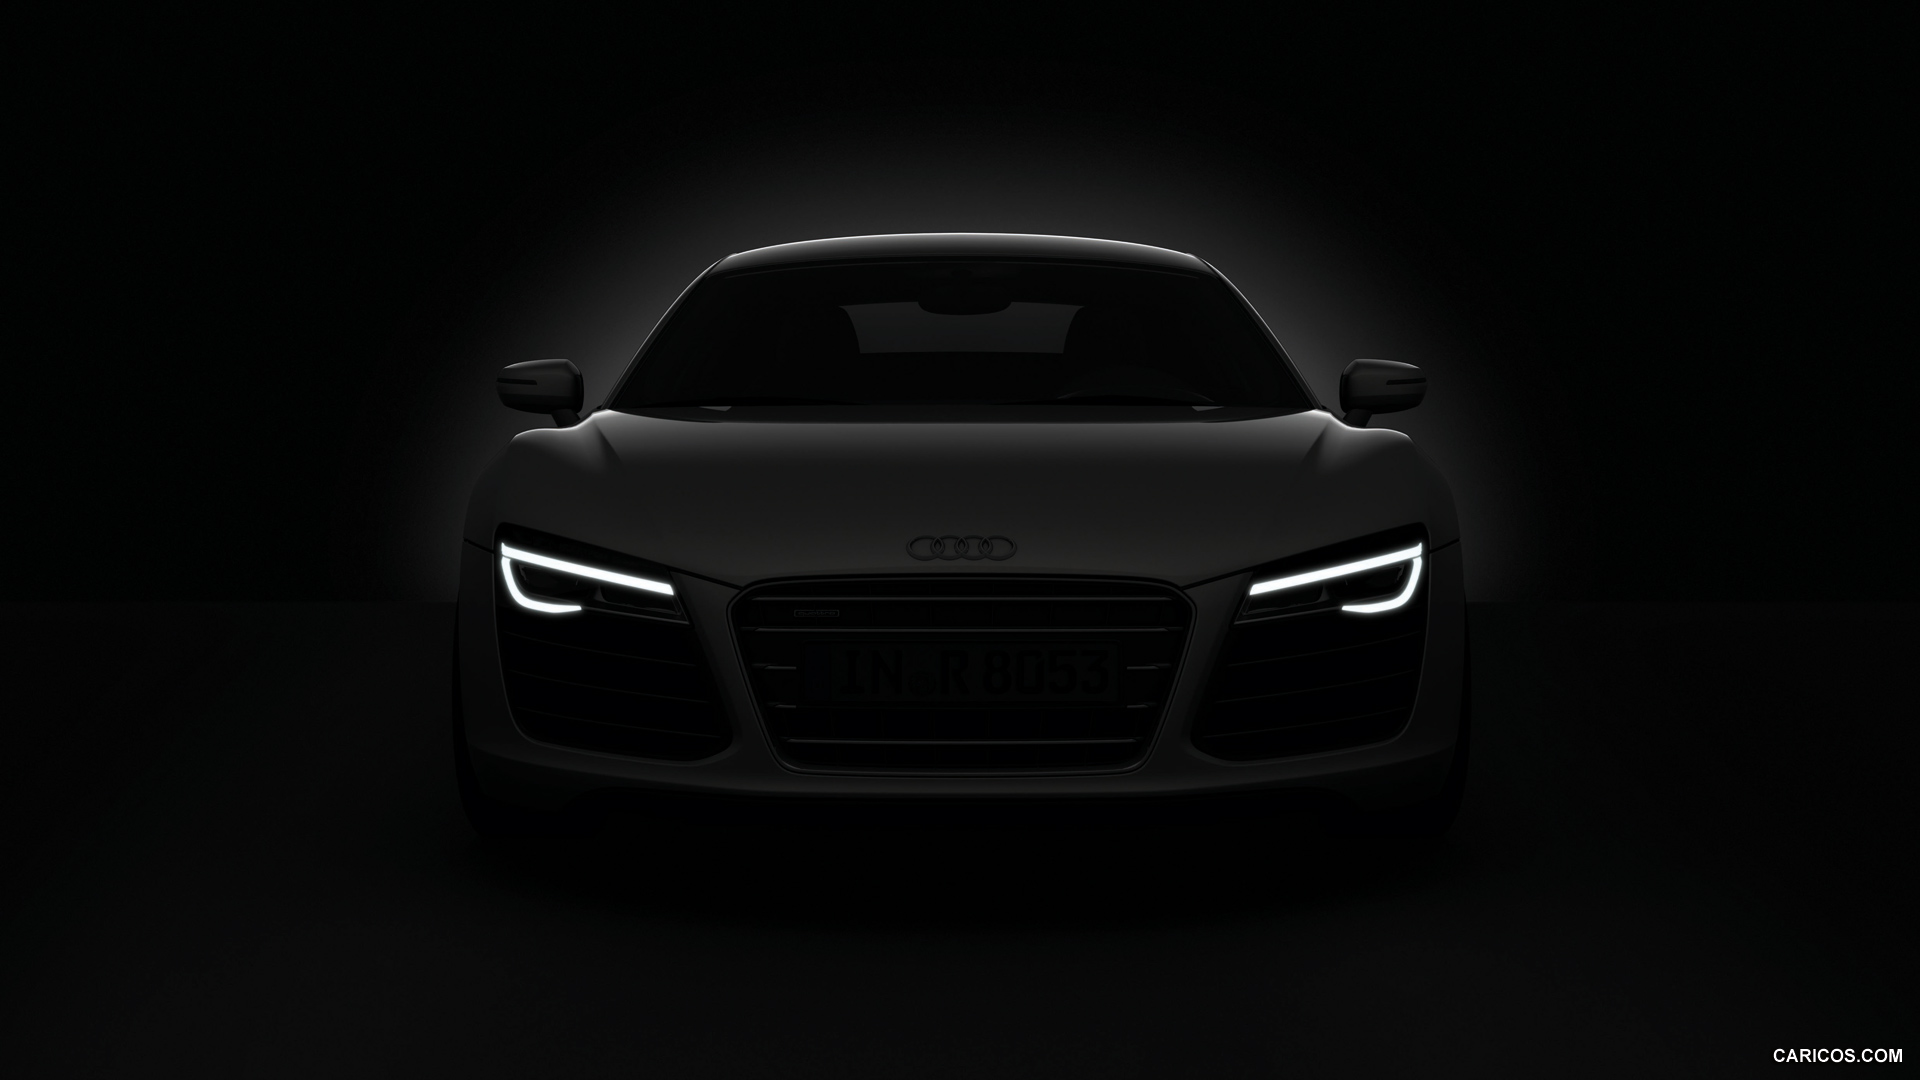 2013 Audi R8 LED Headlights | HD Wallpaper #31